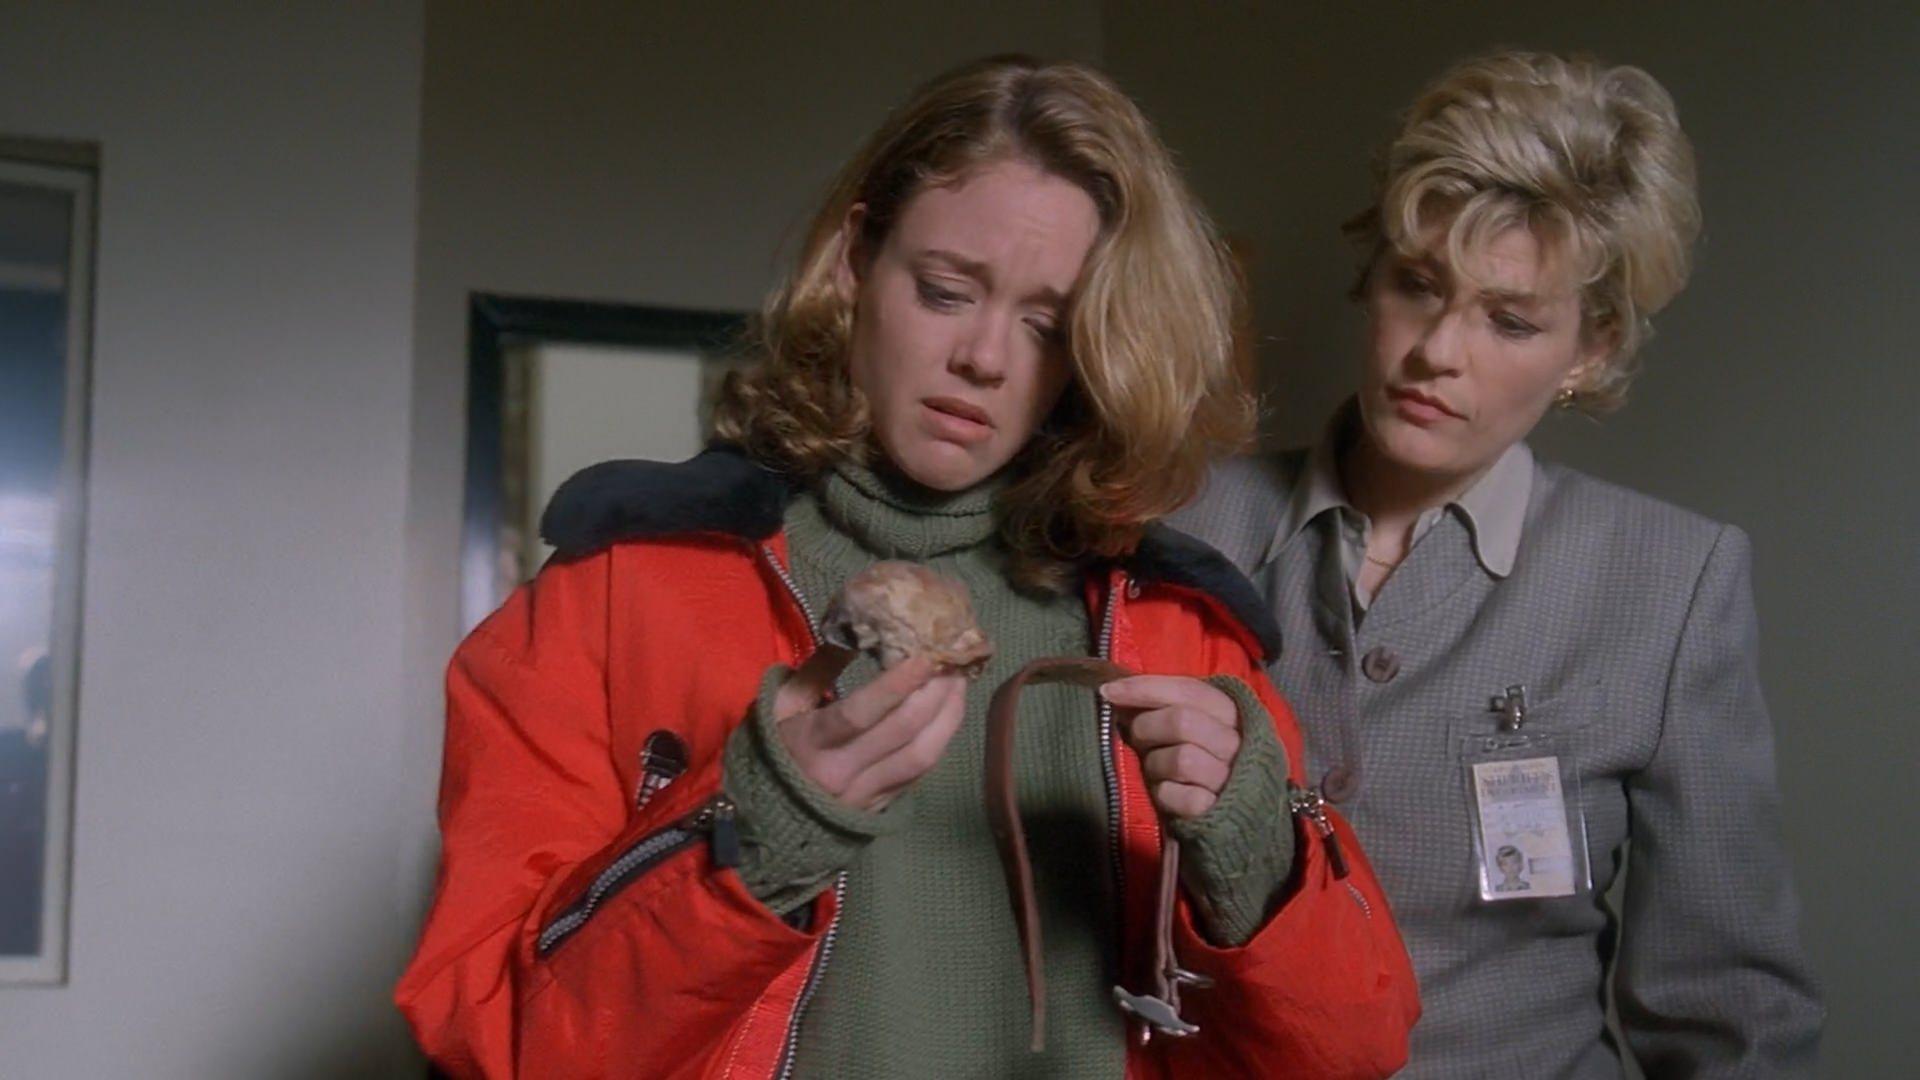 Lisa Robin Kelly and Dana Wheeler-Nicholson in The X Files (1993)